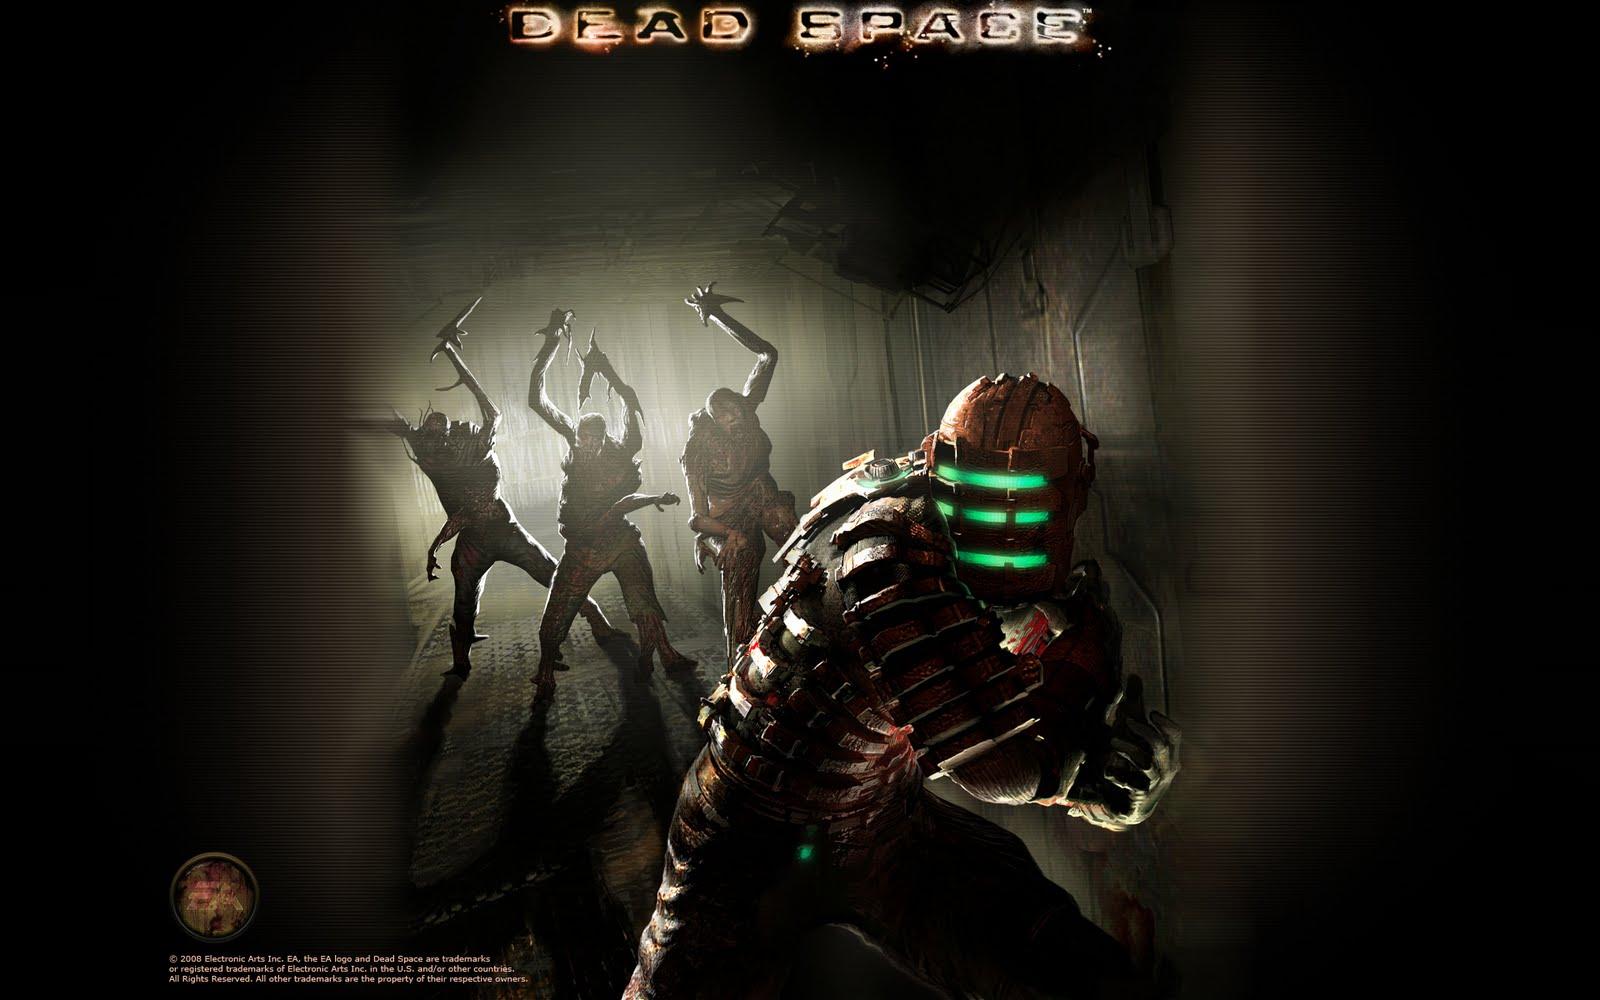 640x960 Dead Space Iphone 4 wallpaper